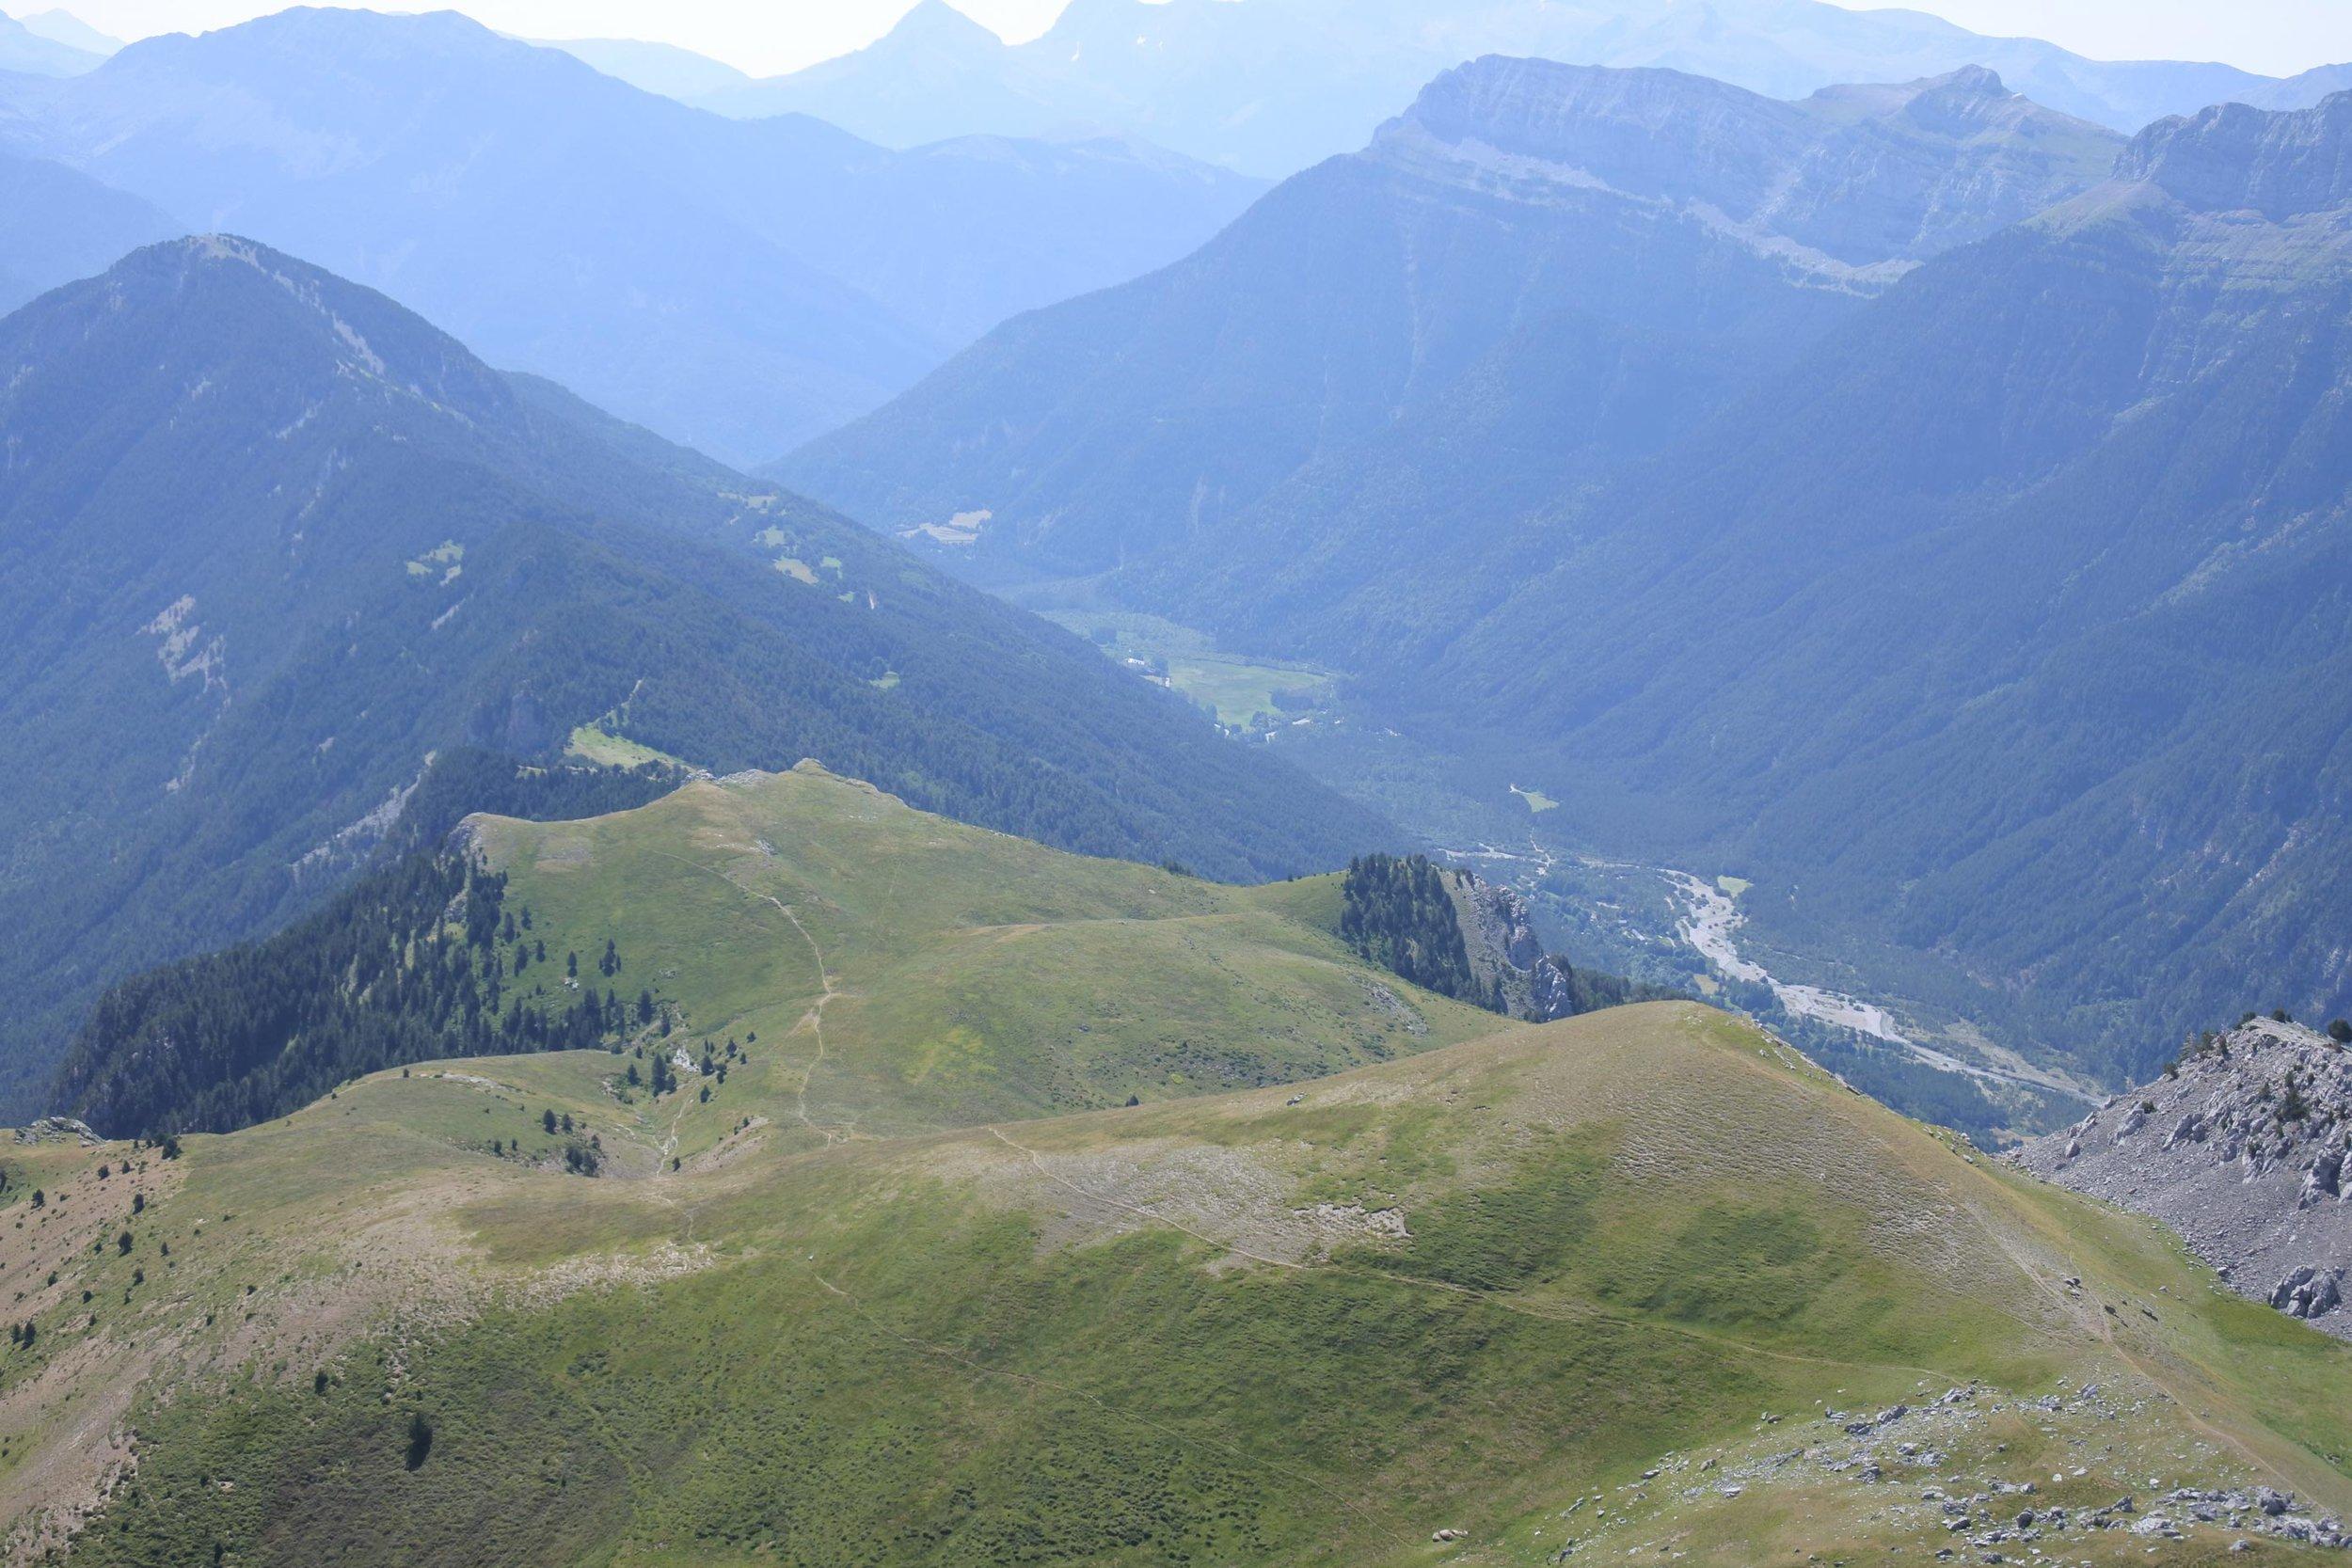 unbeaten-adventures-zona-zero-ainsa-comodoto-view-from-the=top.jpg